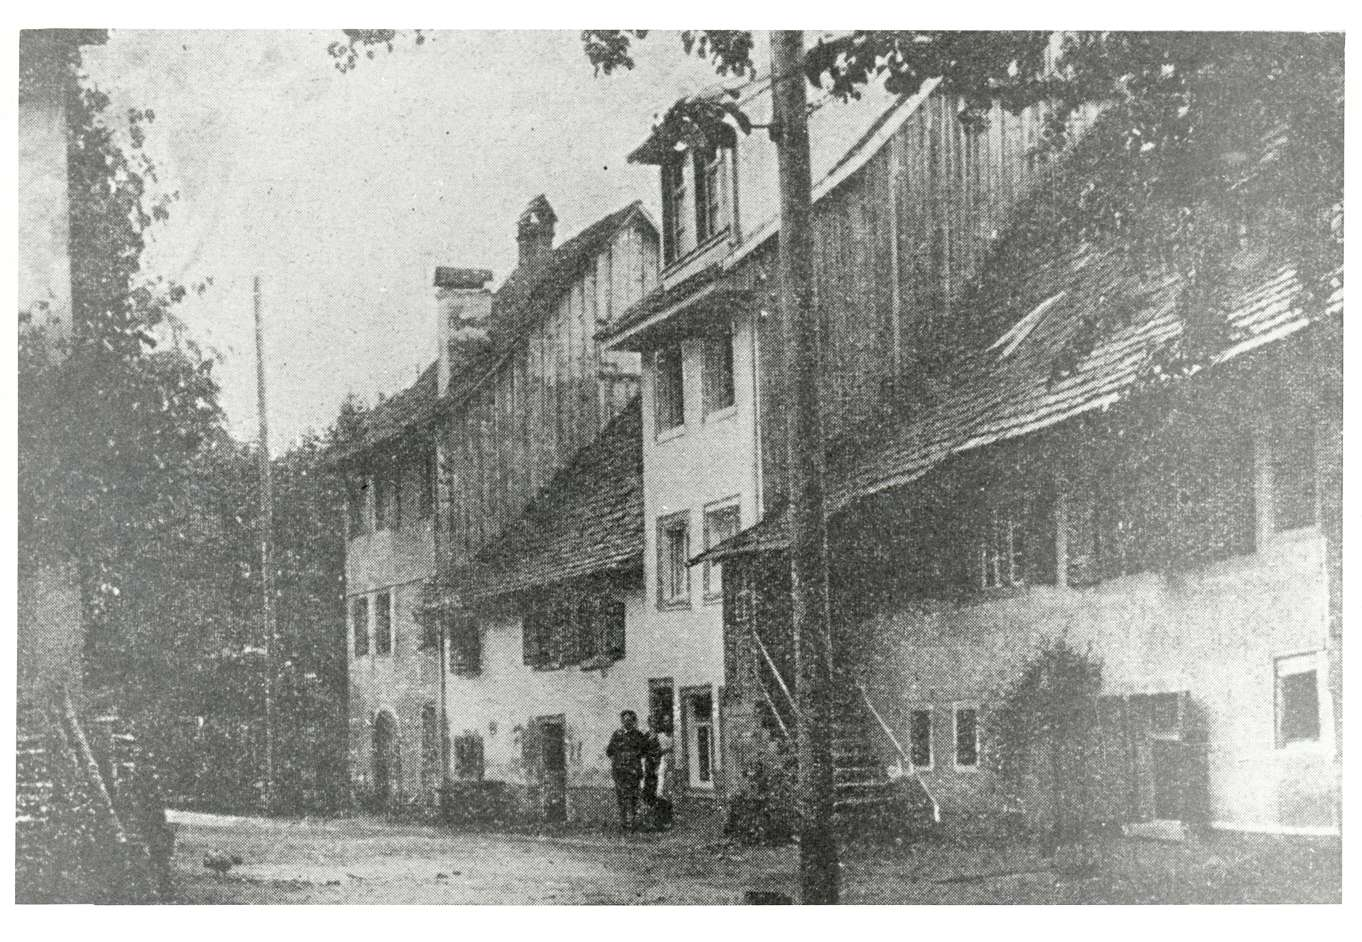 Wangen, Öhningen, KN; Judengasse, Bild 1